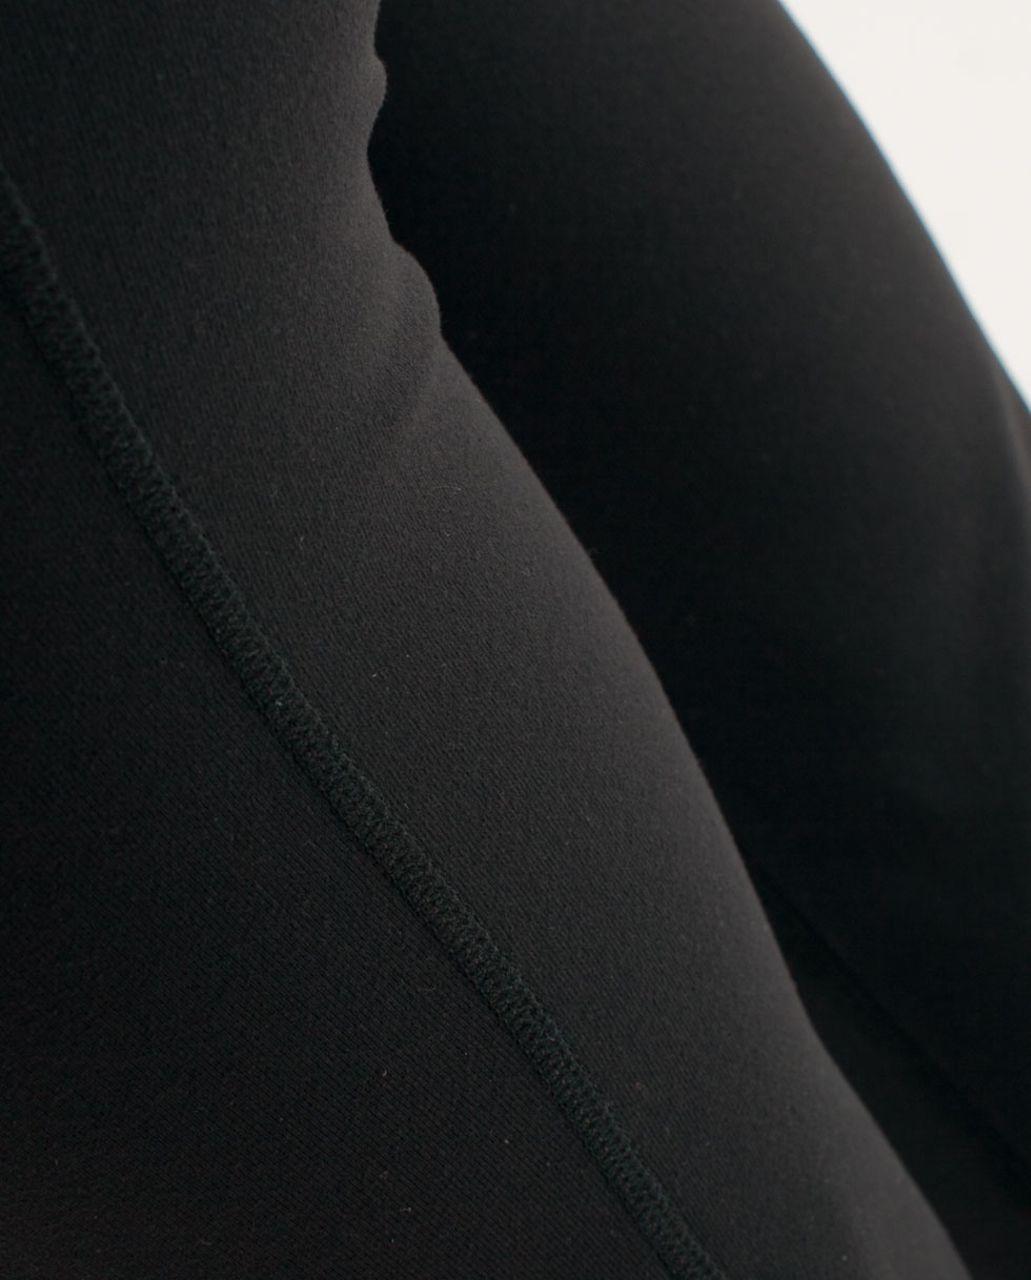 Lululemon Groove Crop - Black /  Quilt 18